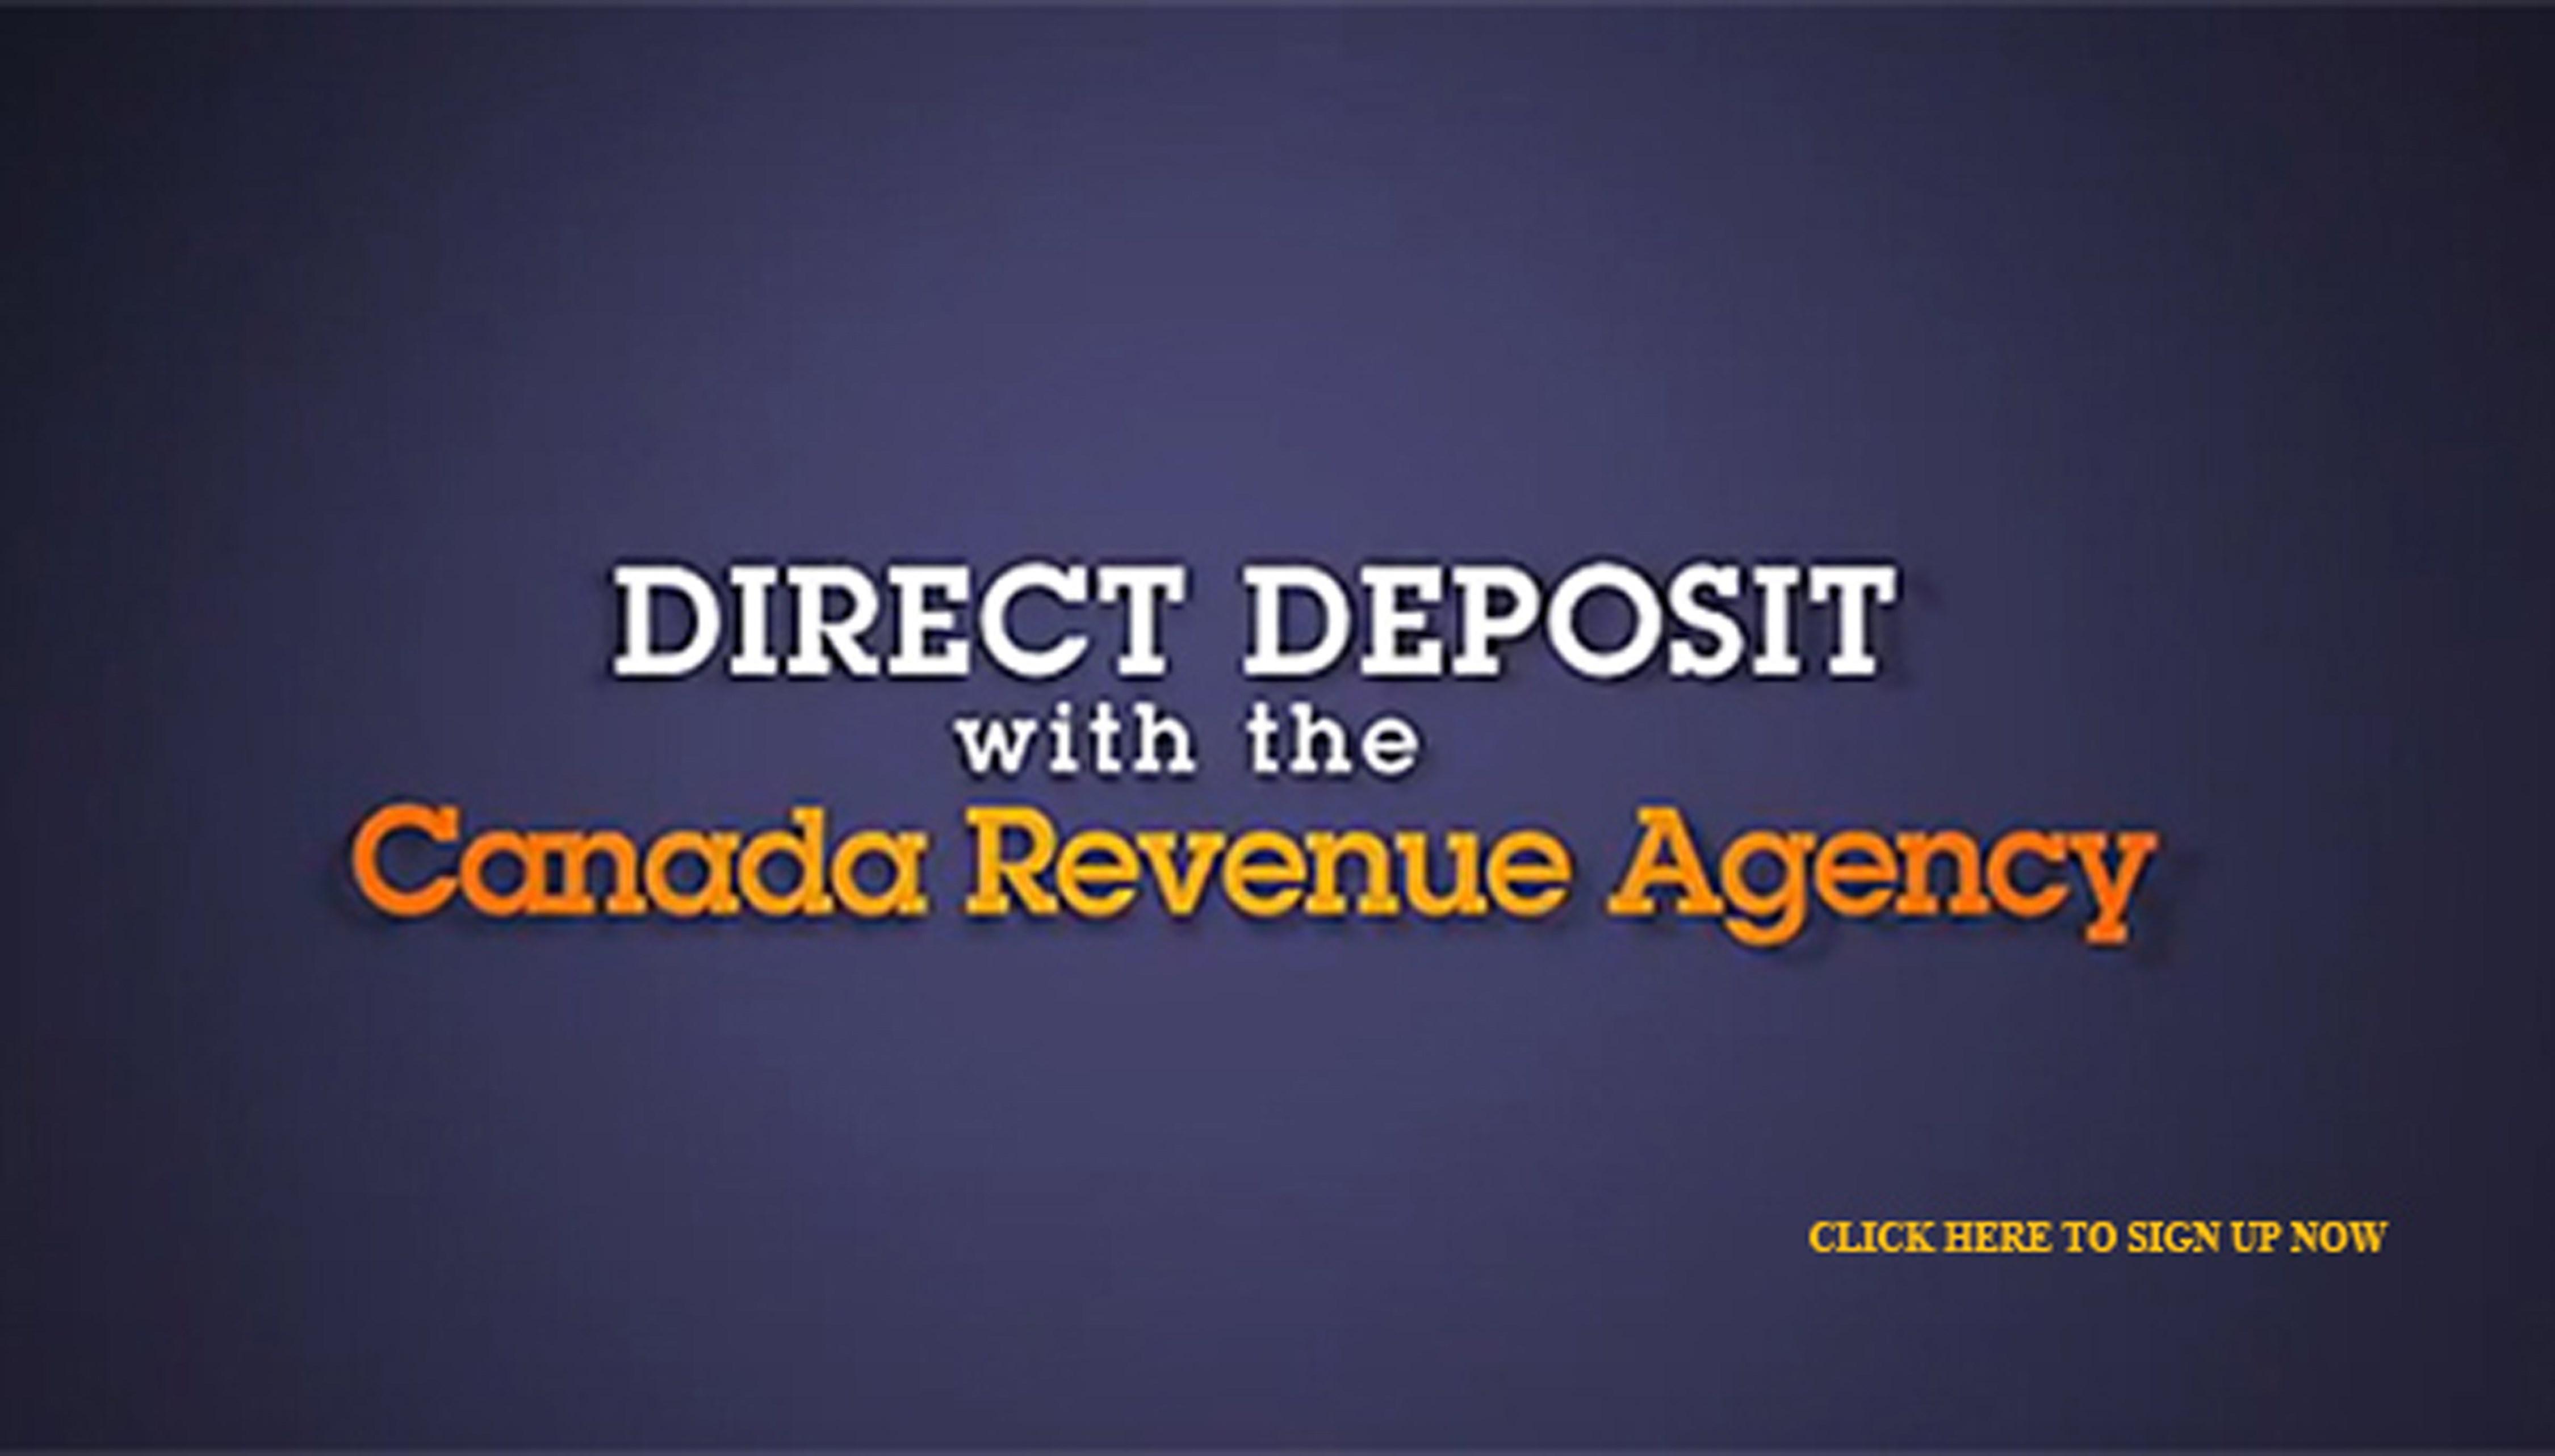 Direct deposit ad